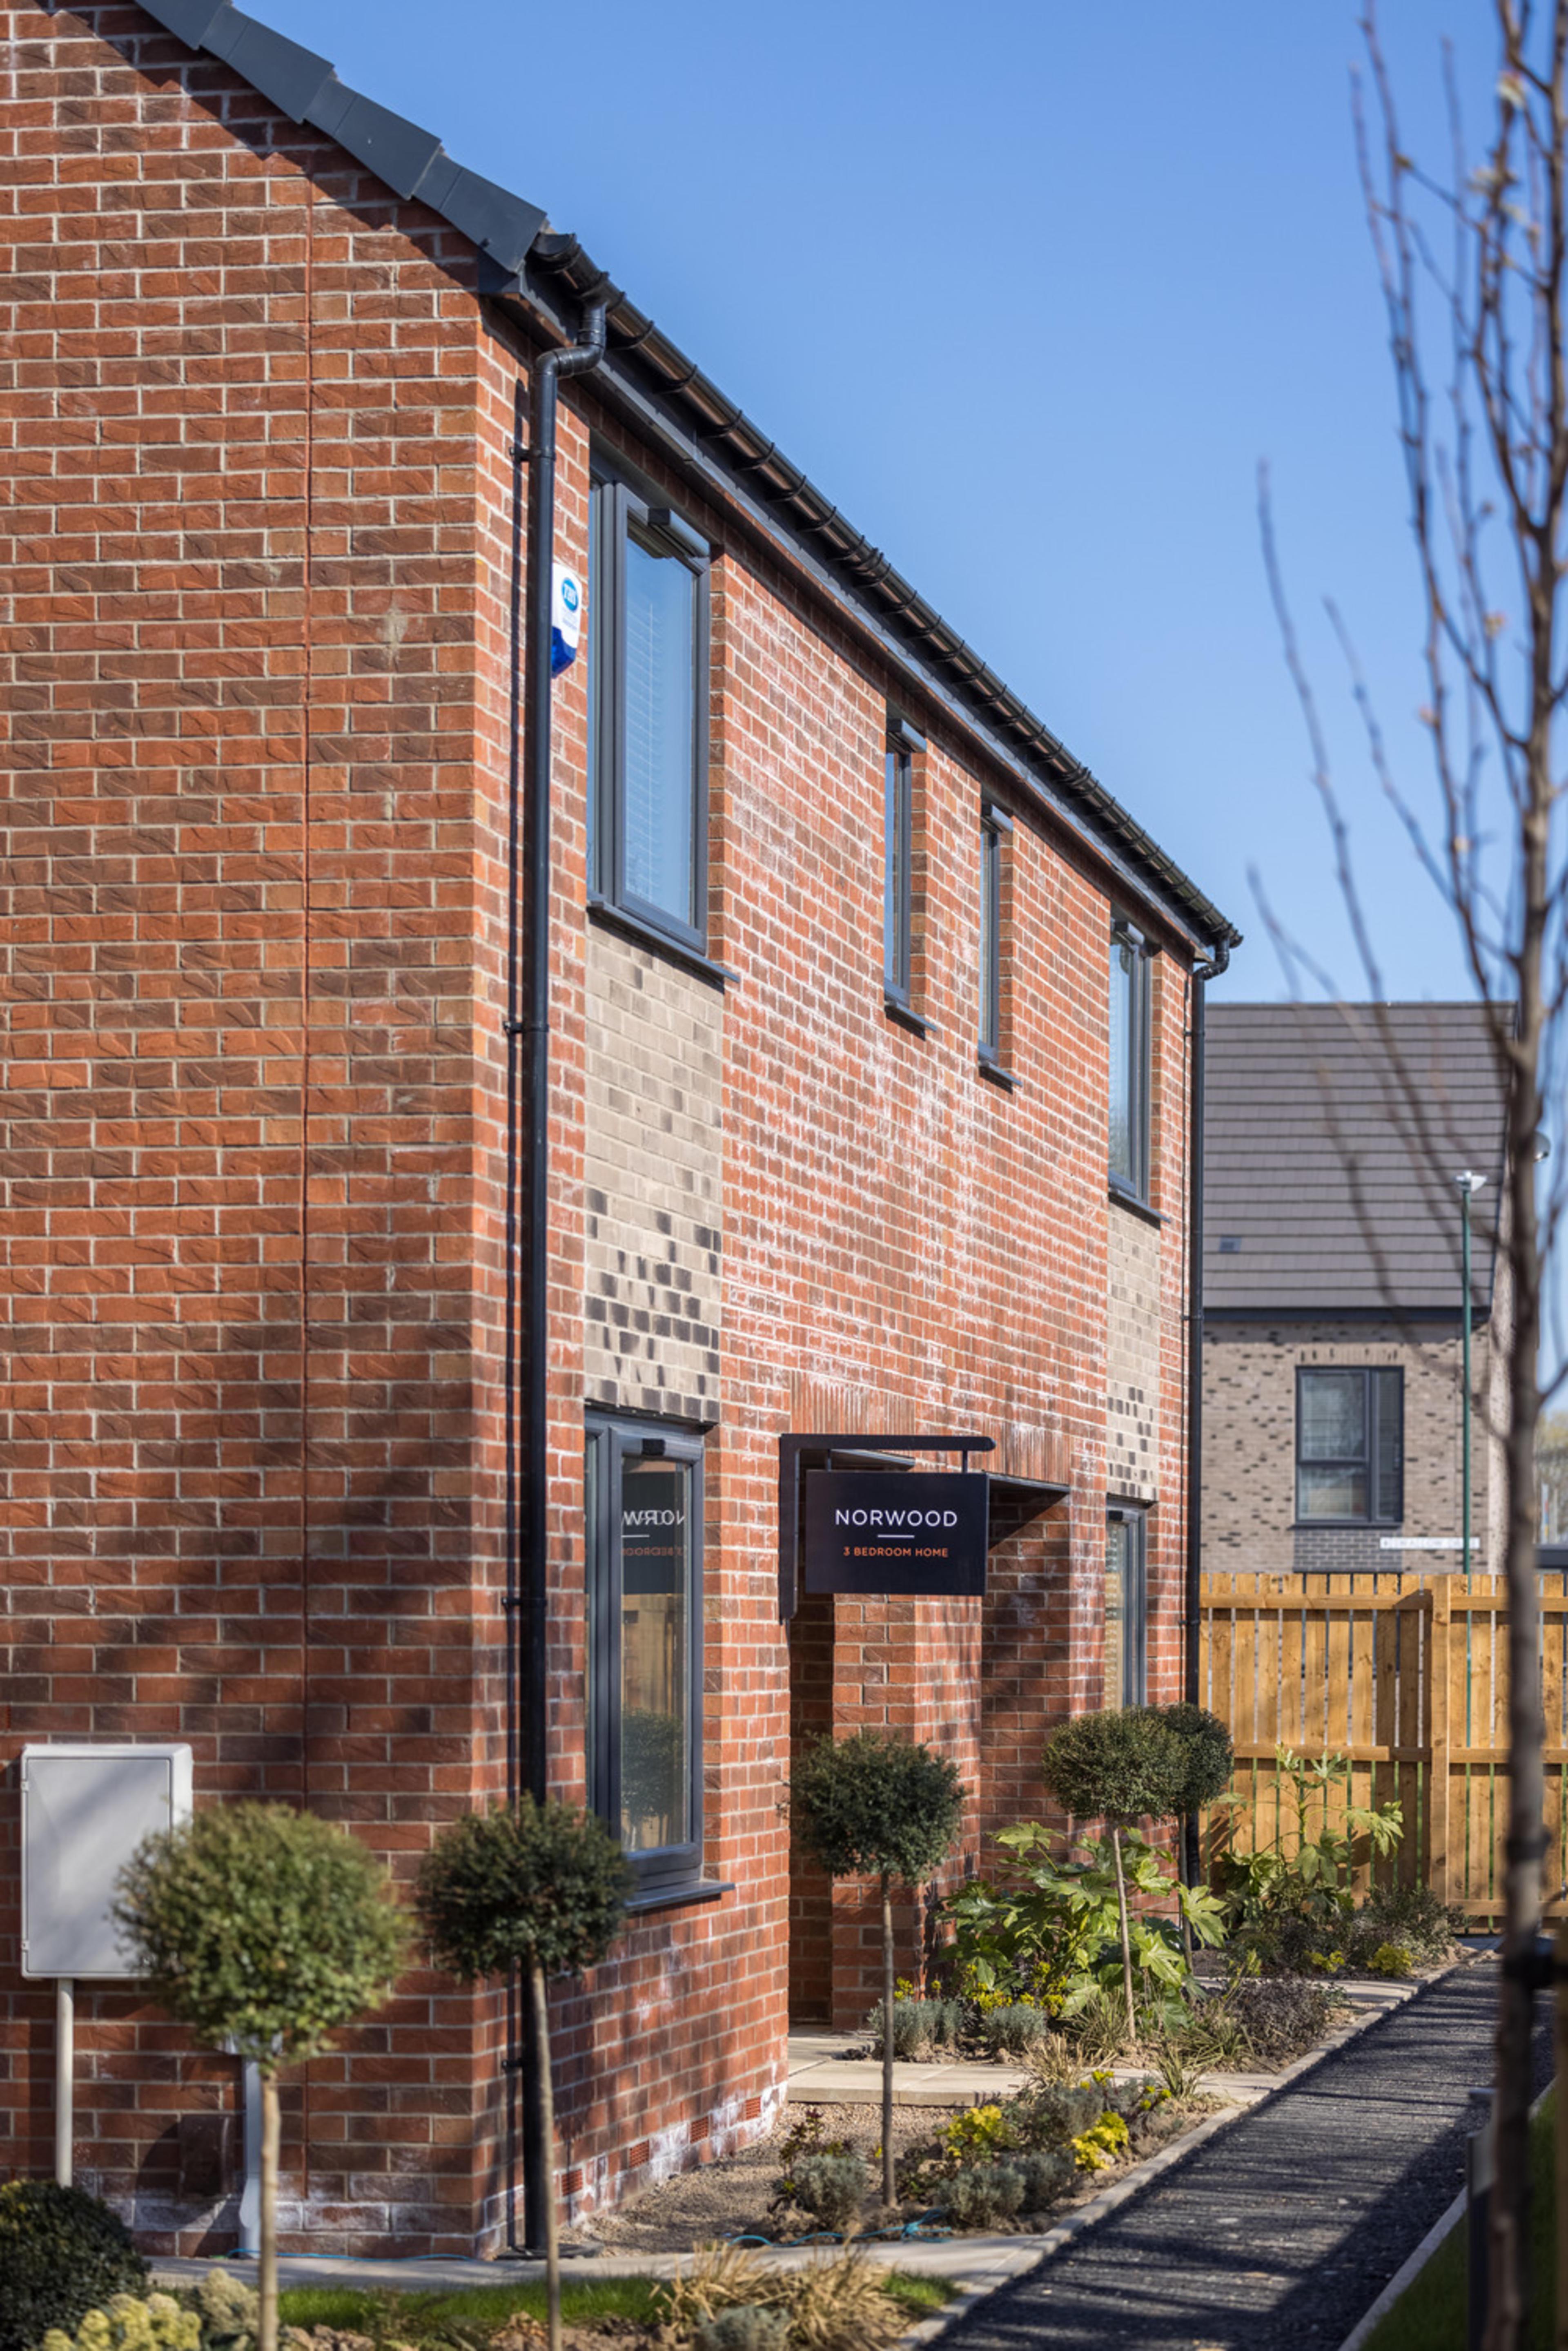 Ellison-Grove-Hebburn-norwood-3-bed-house-1